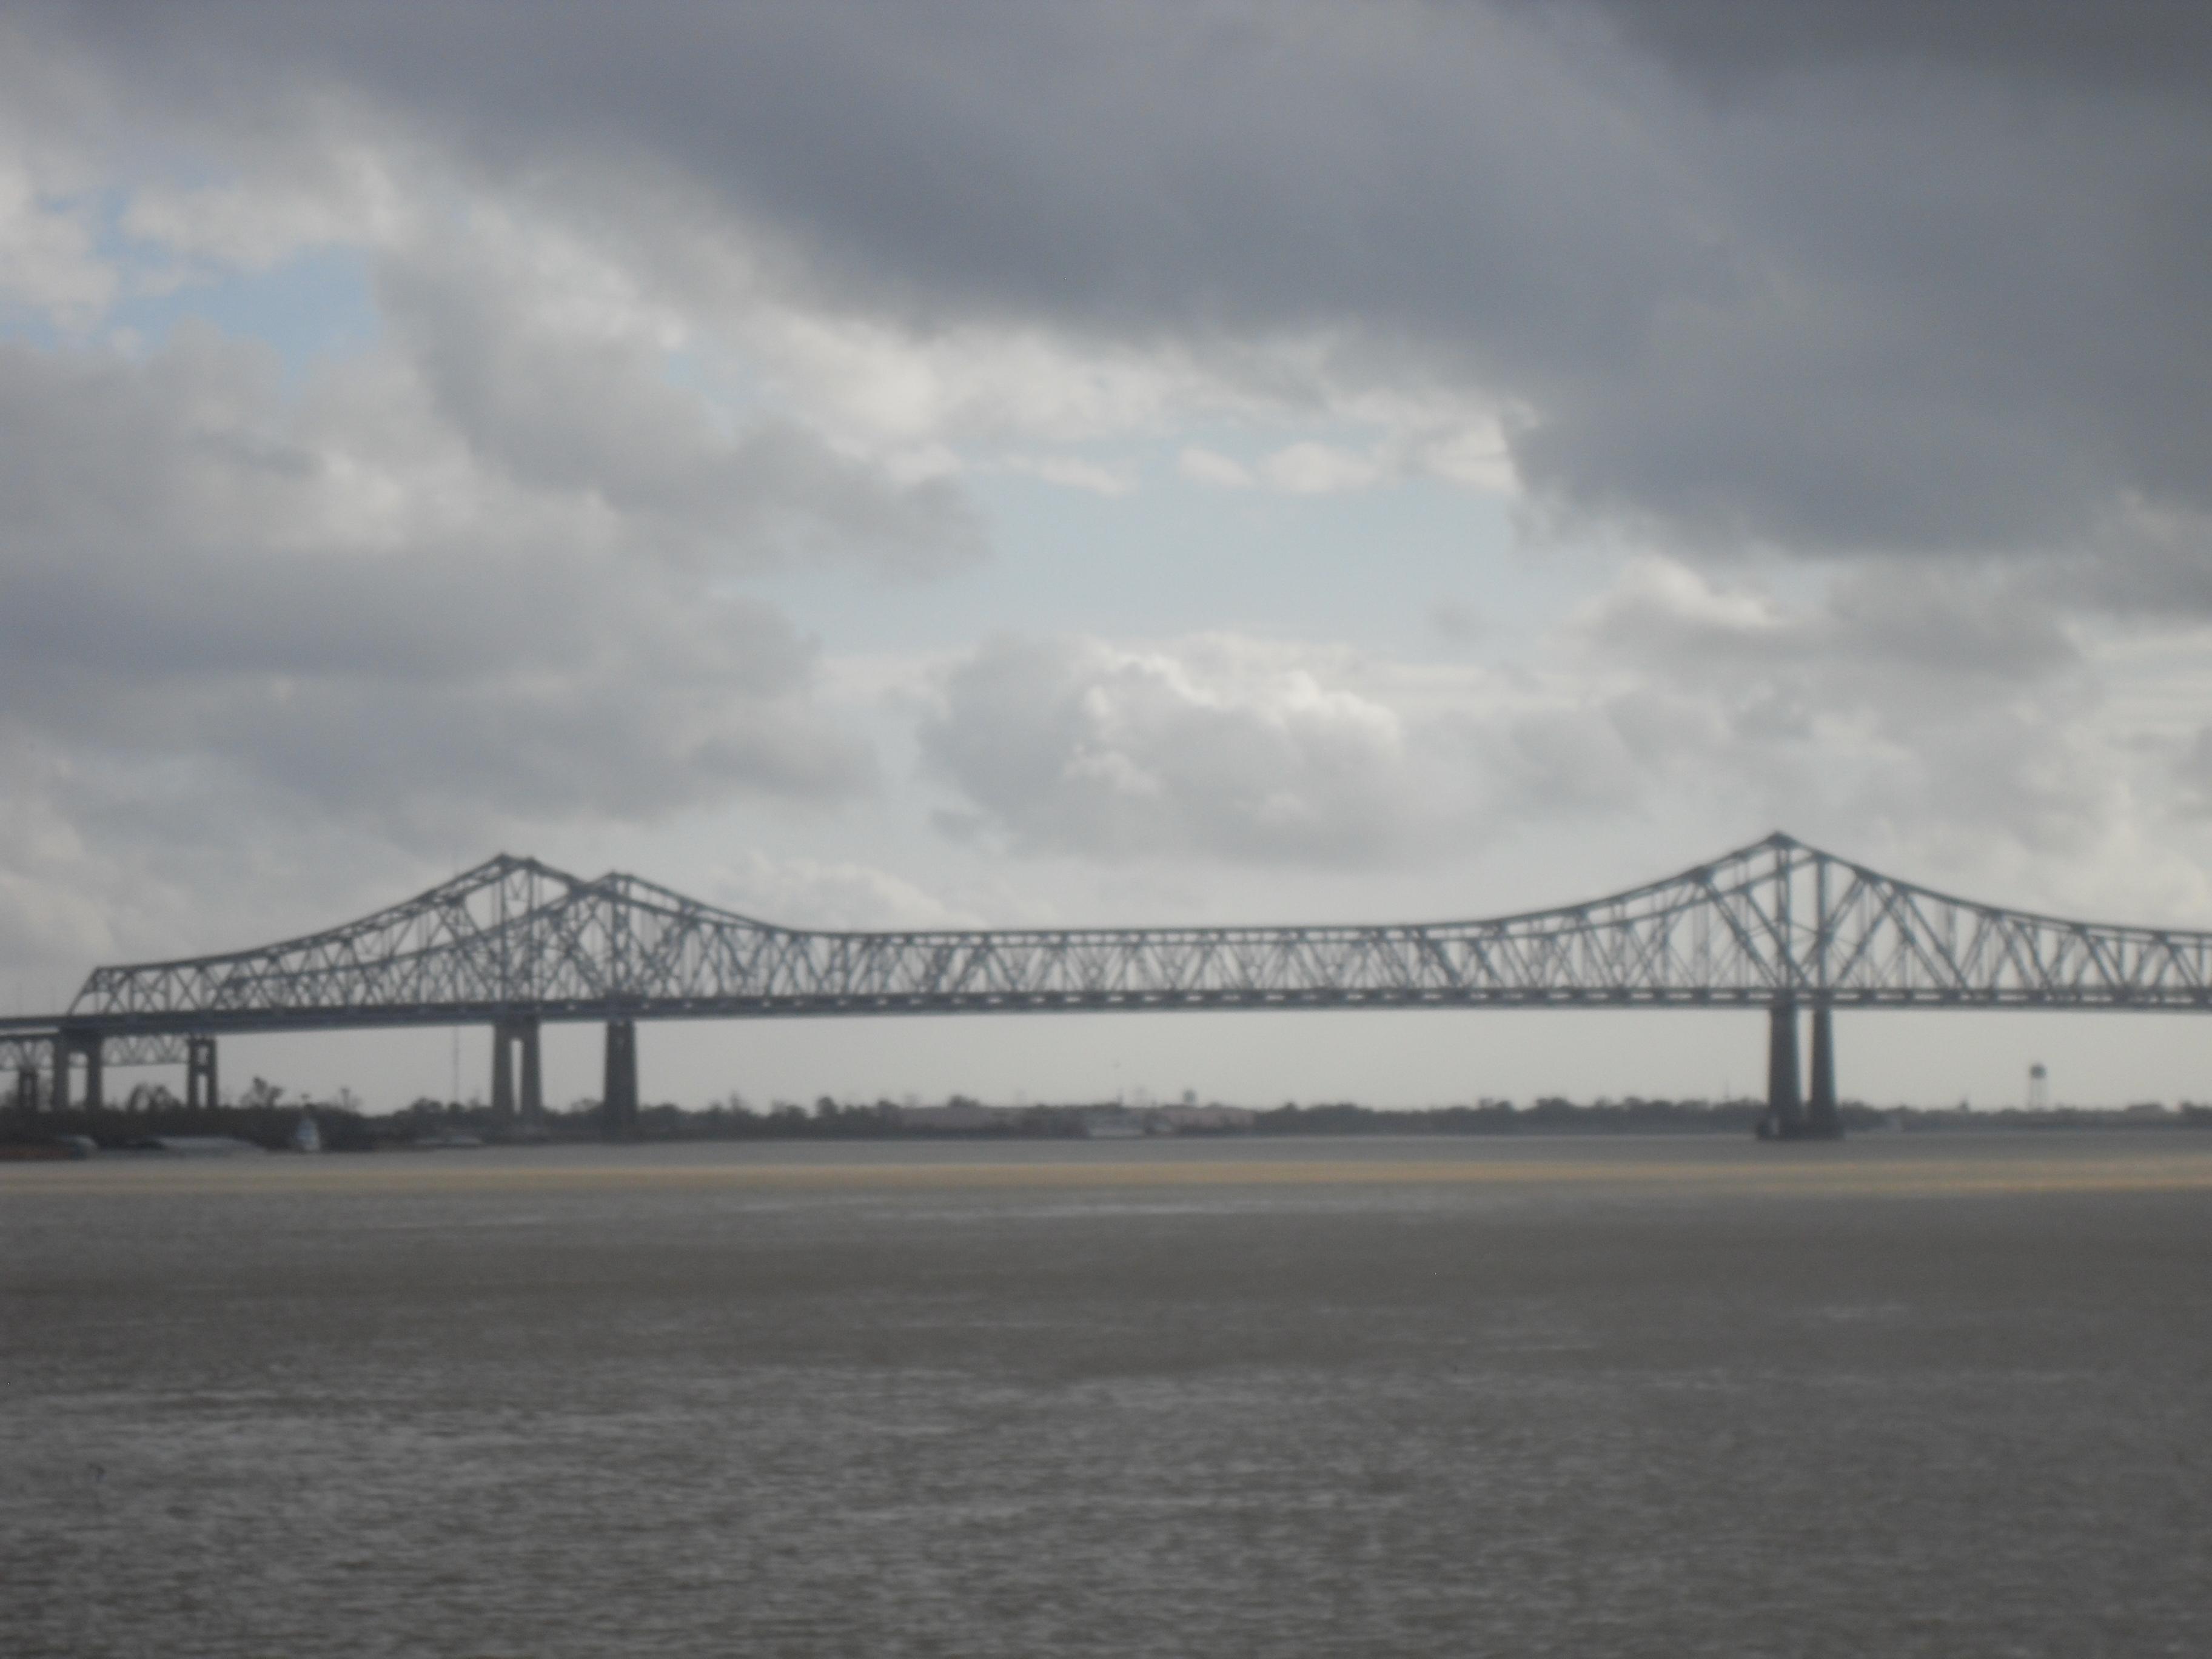 A bridge over the Mississipi